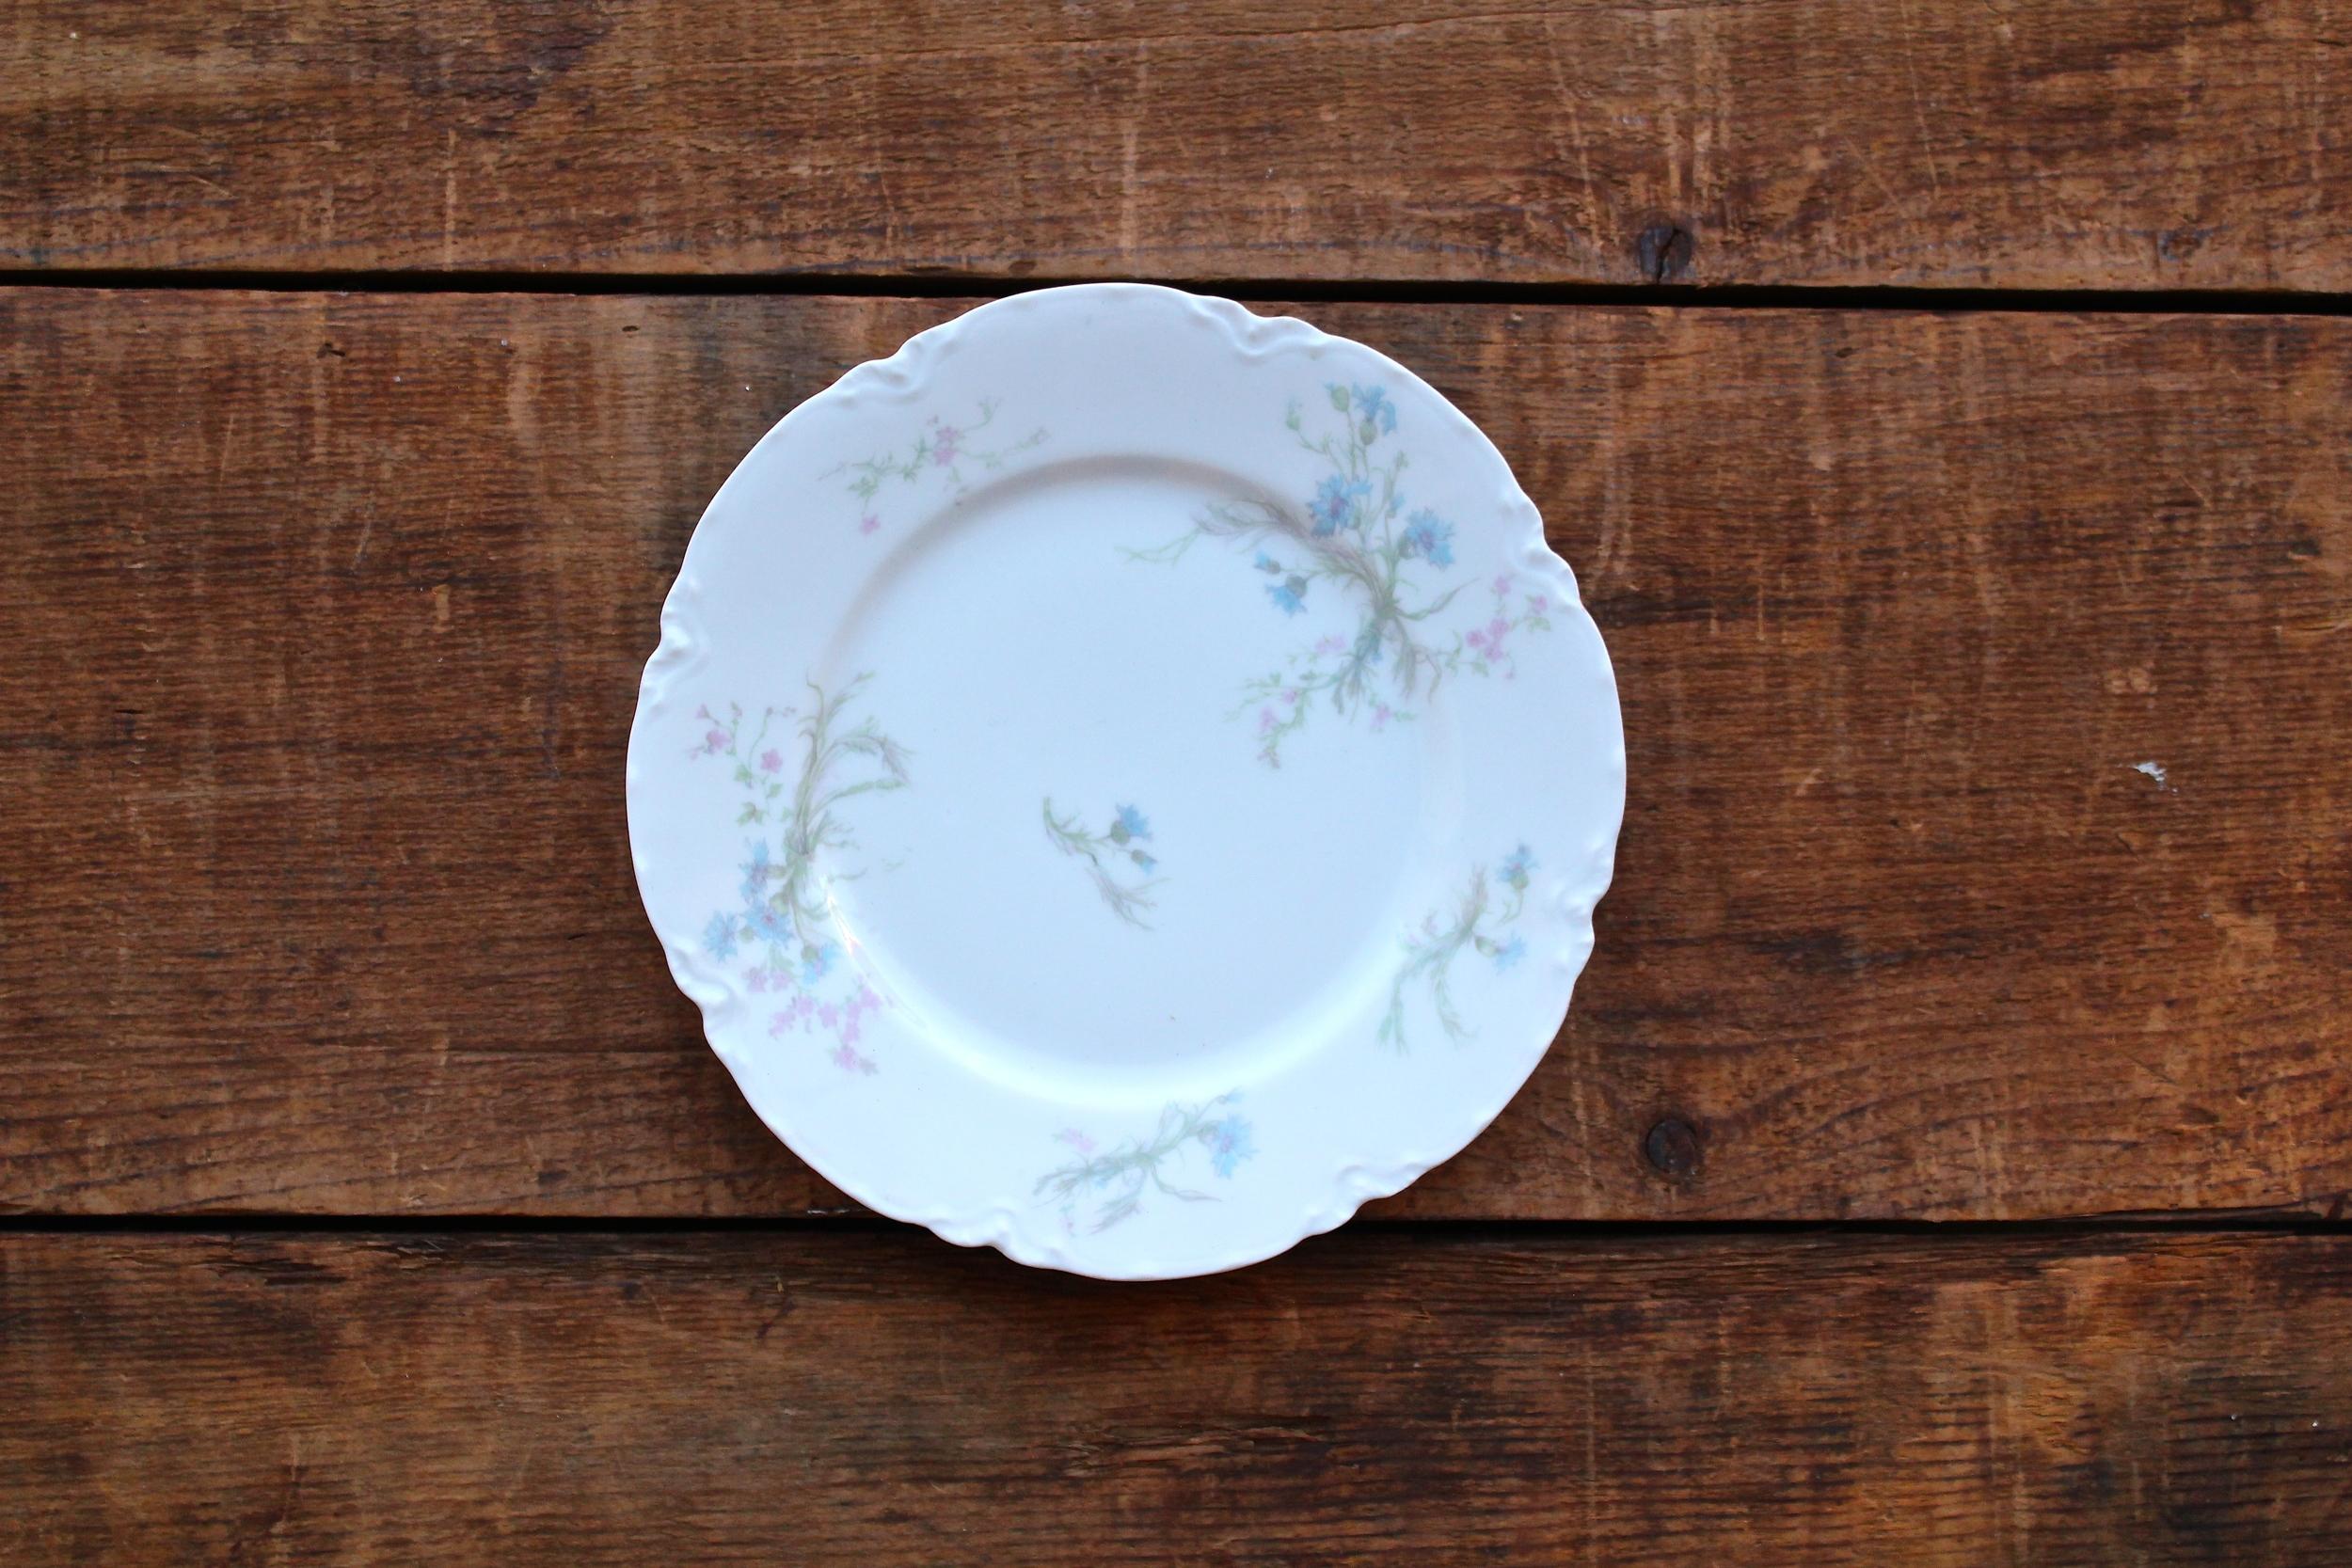 Soft Floral Collection Dessert Plates